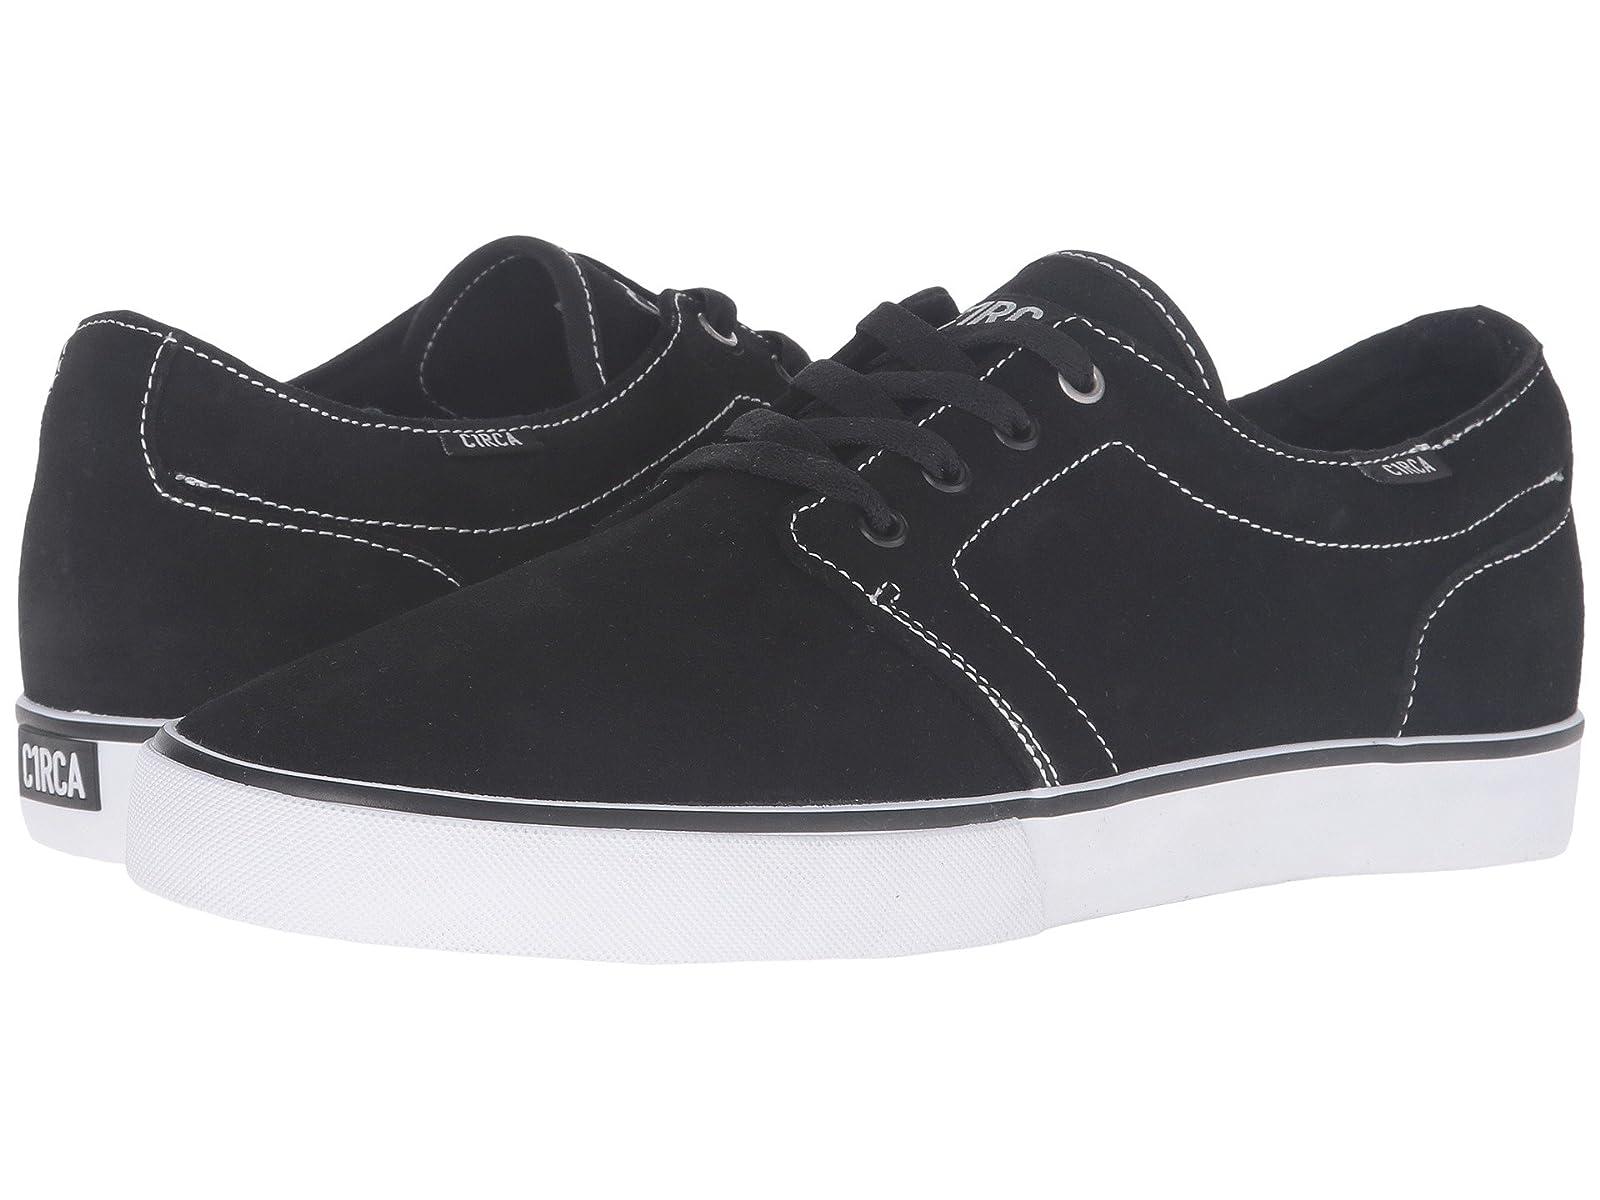 Circa DrifterCheap and distinctive eye-catching shoes